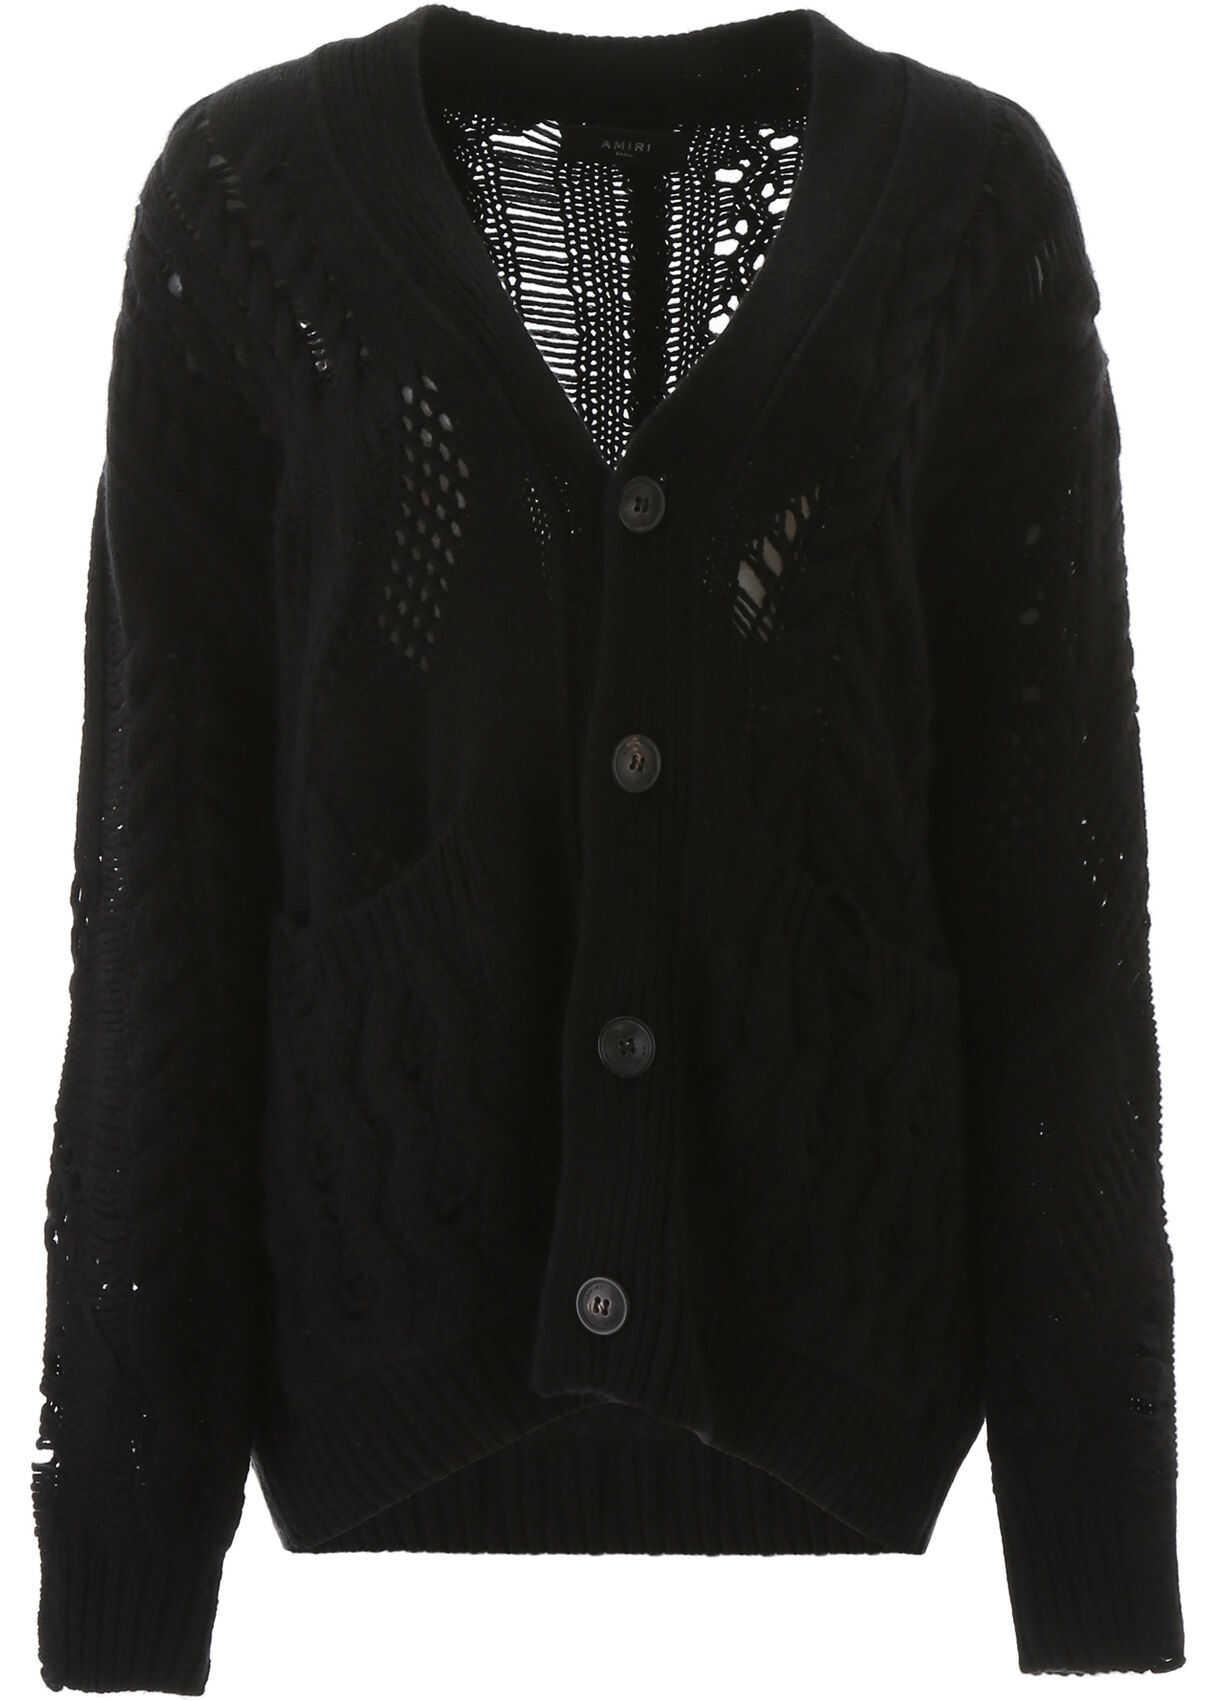 AMIRI Oversized Cardigan BLACK